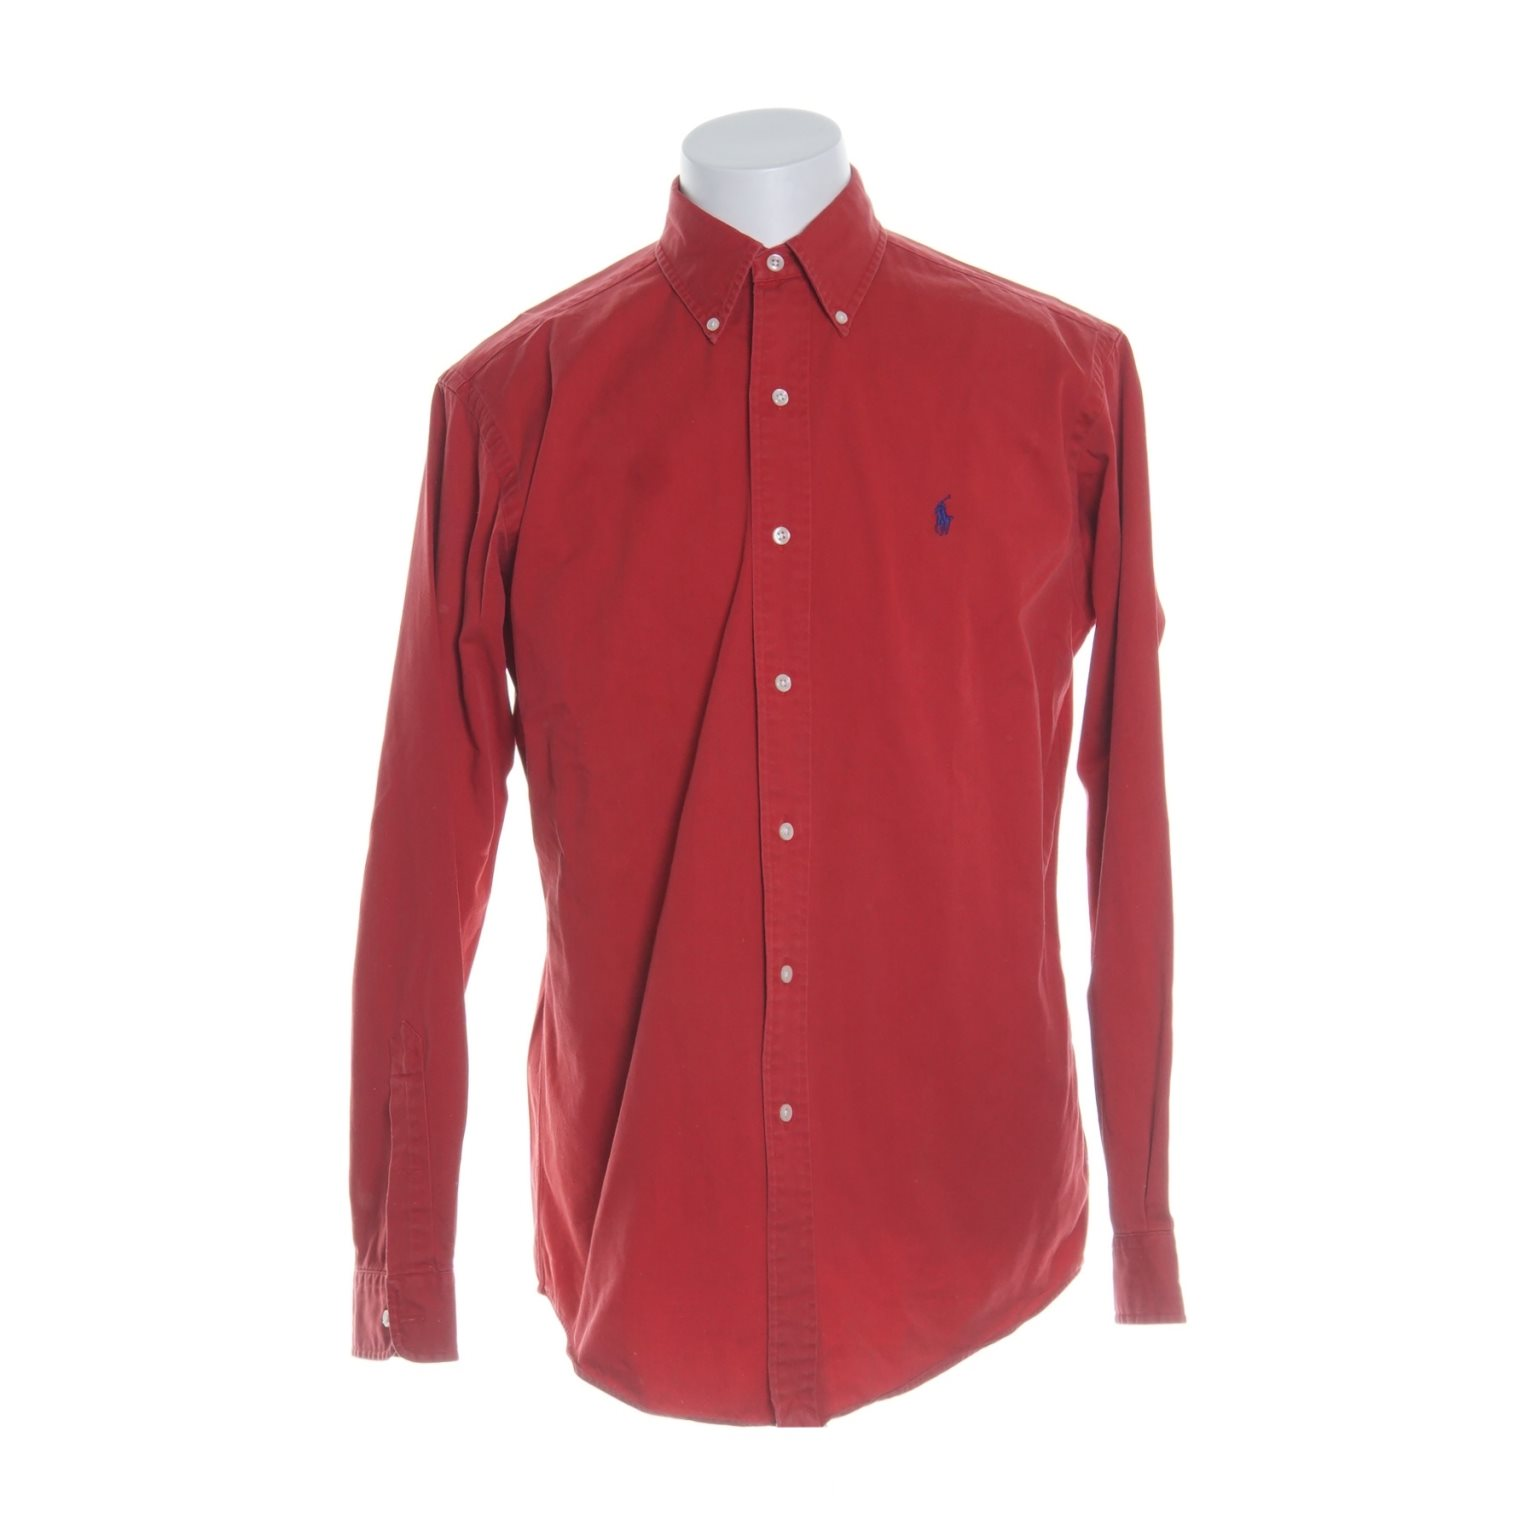 vinröd ralph lauren skjorta